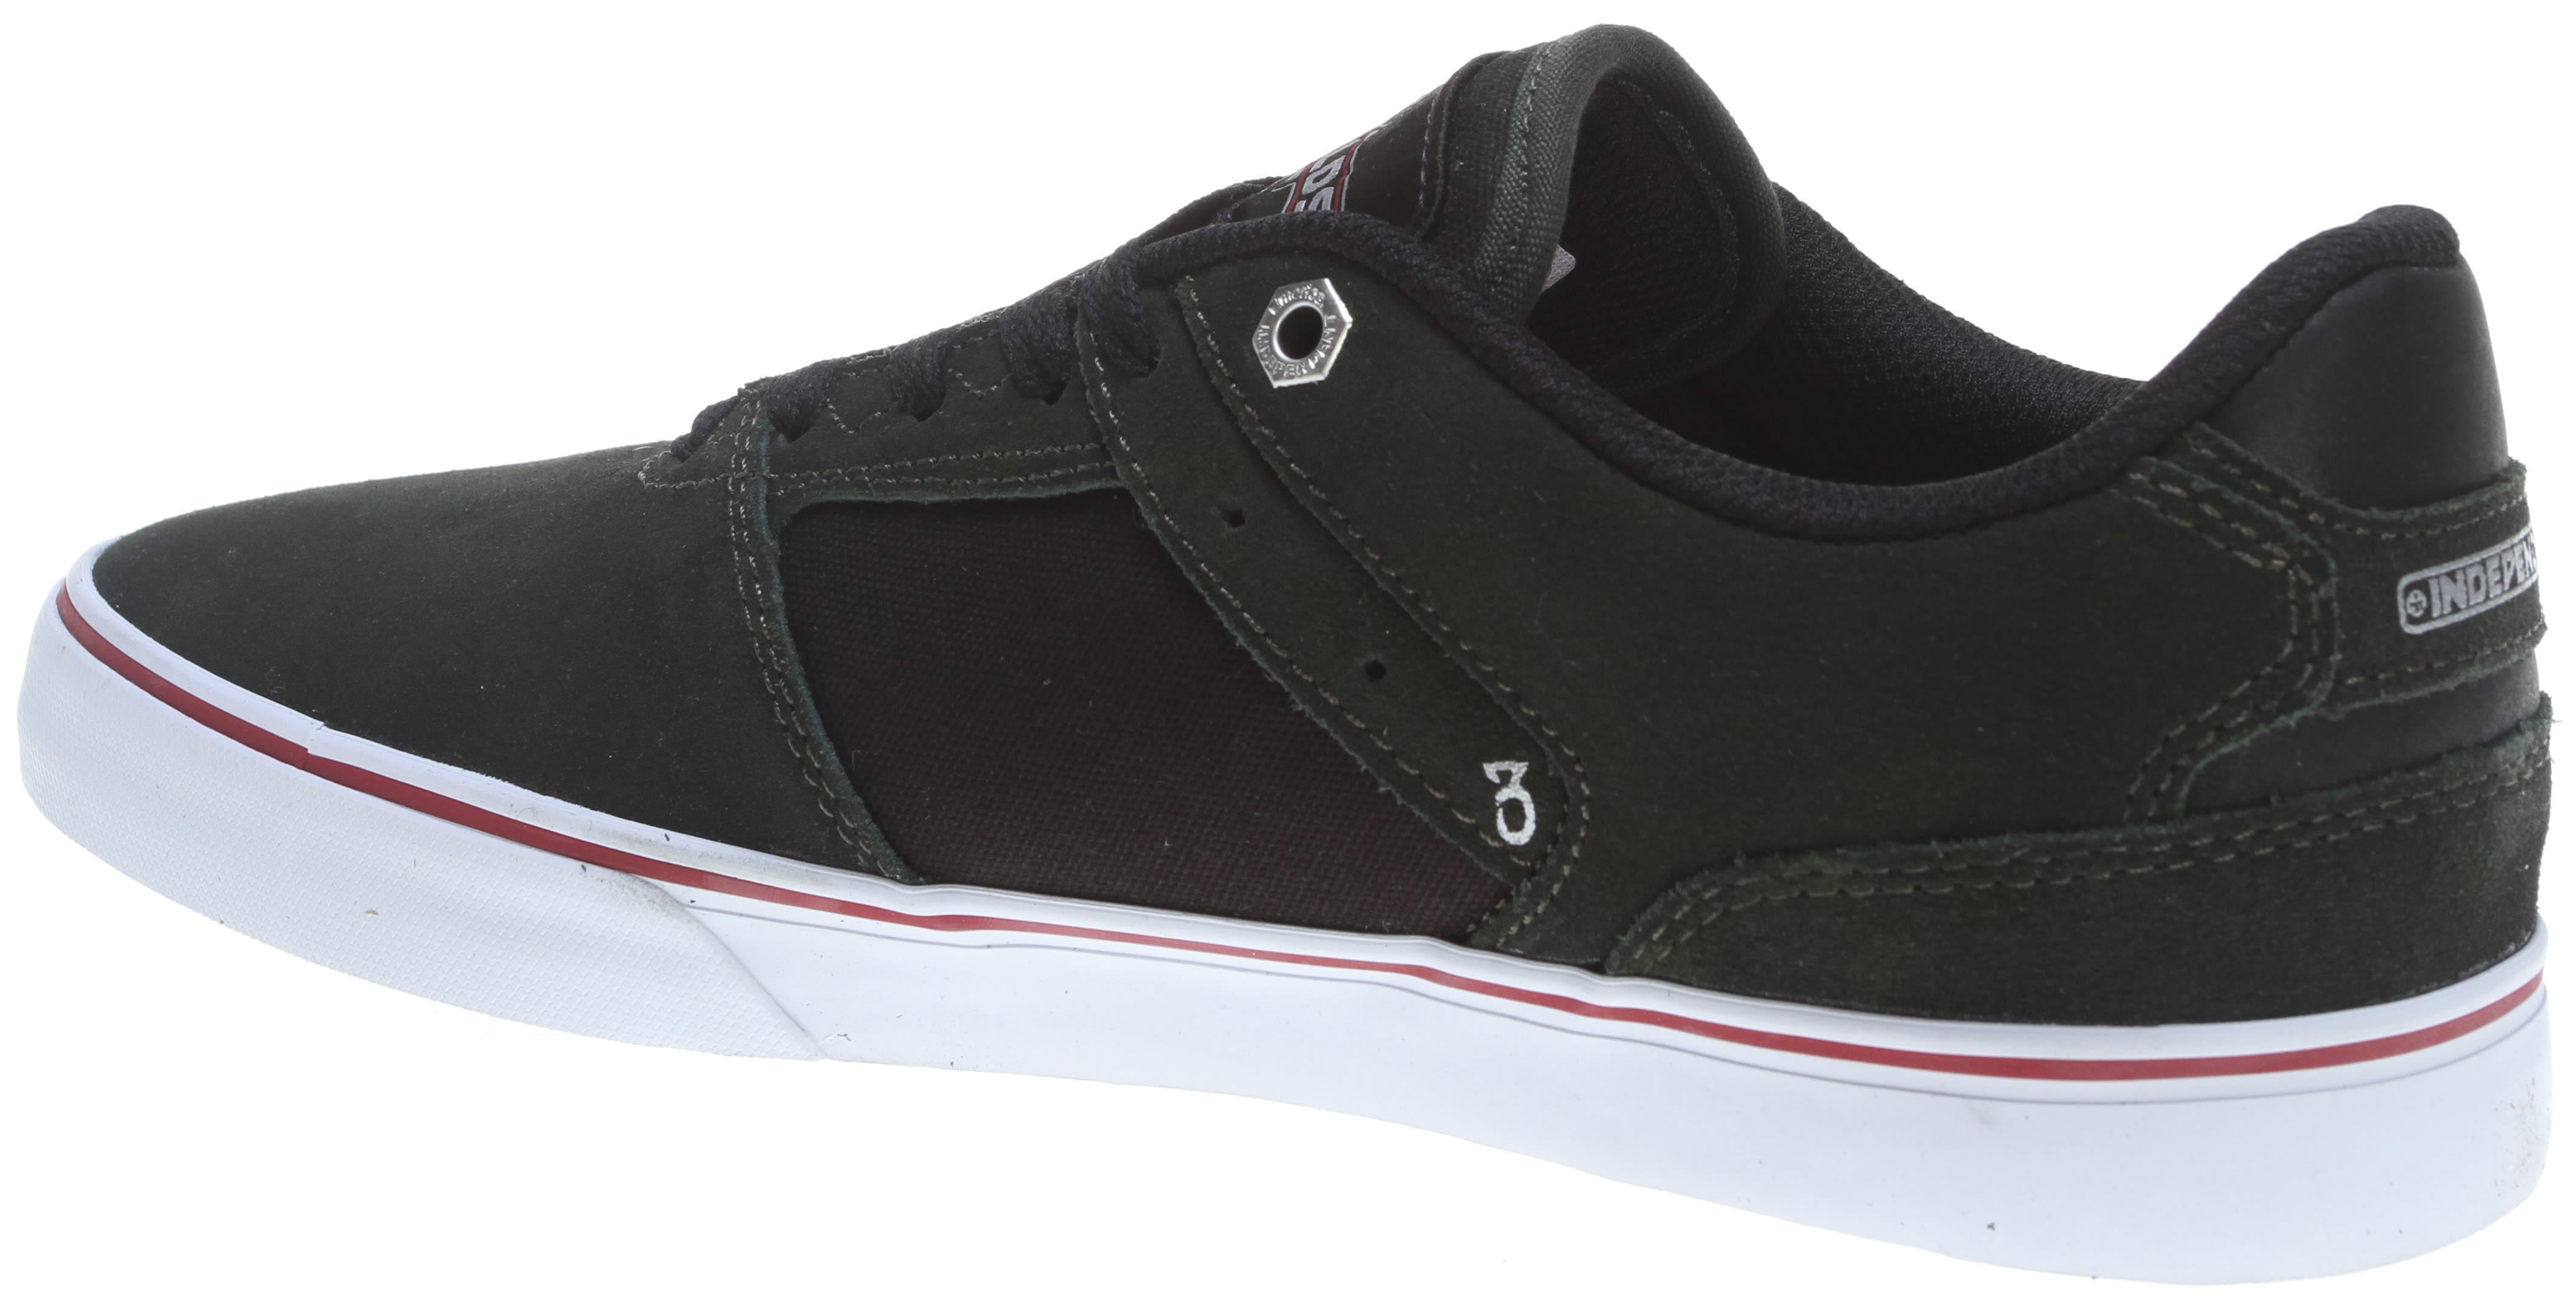 Emerica The Reynolds Low Vulc X Indy Skate Shoes - thumbnail 3